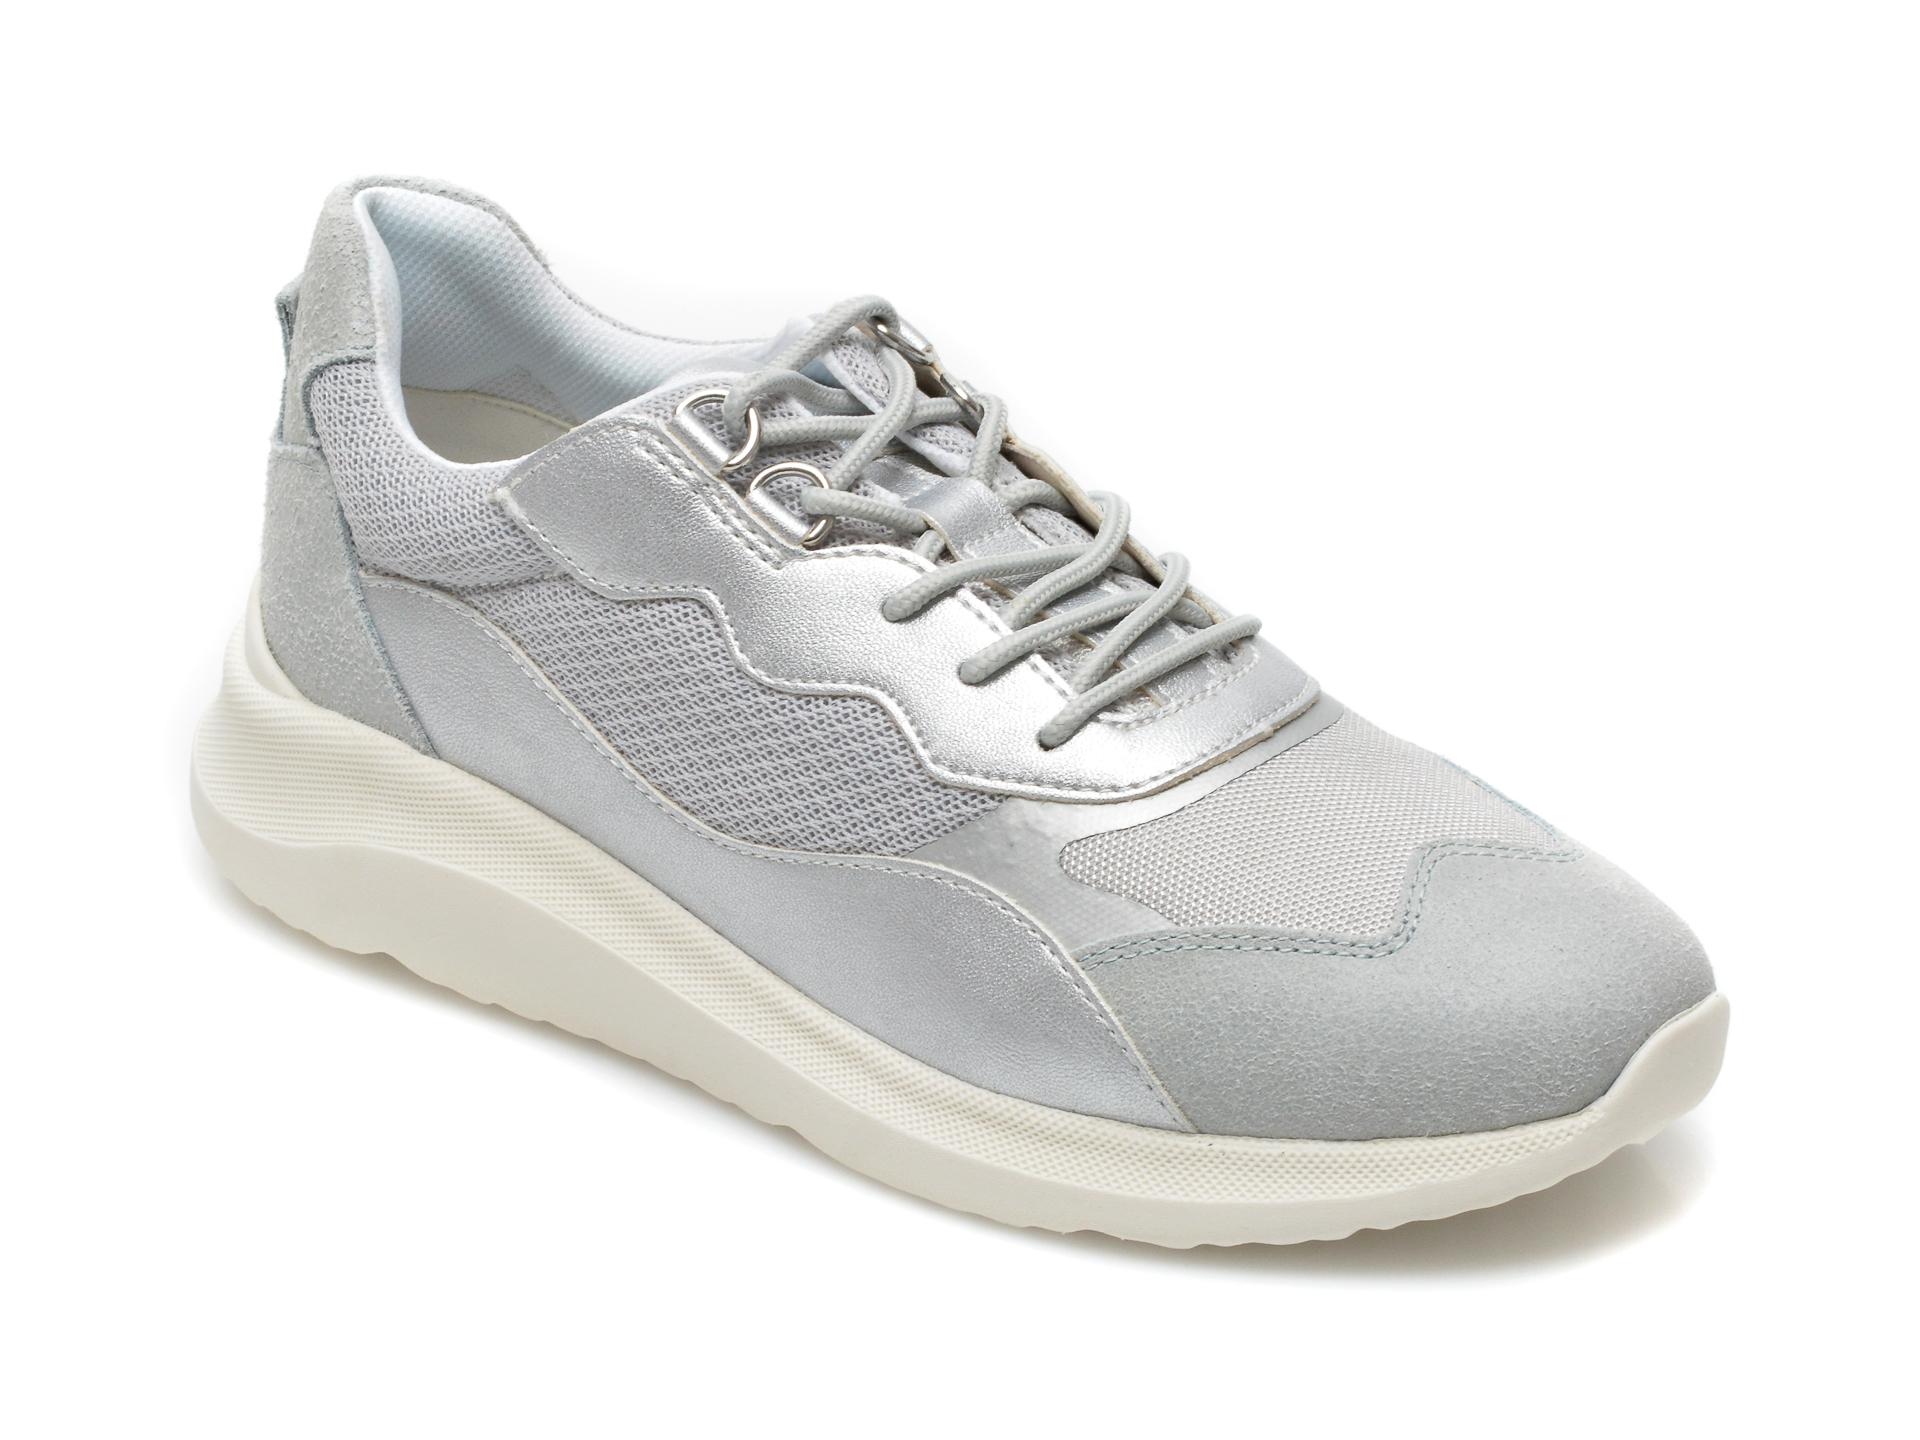 Pantofi sport GEOX argintii, D15NXG, din material textil si piele naturala